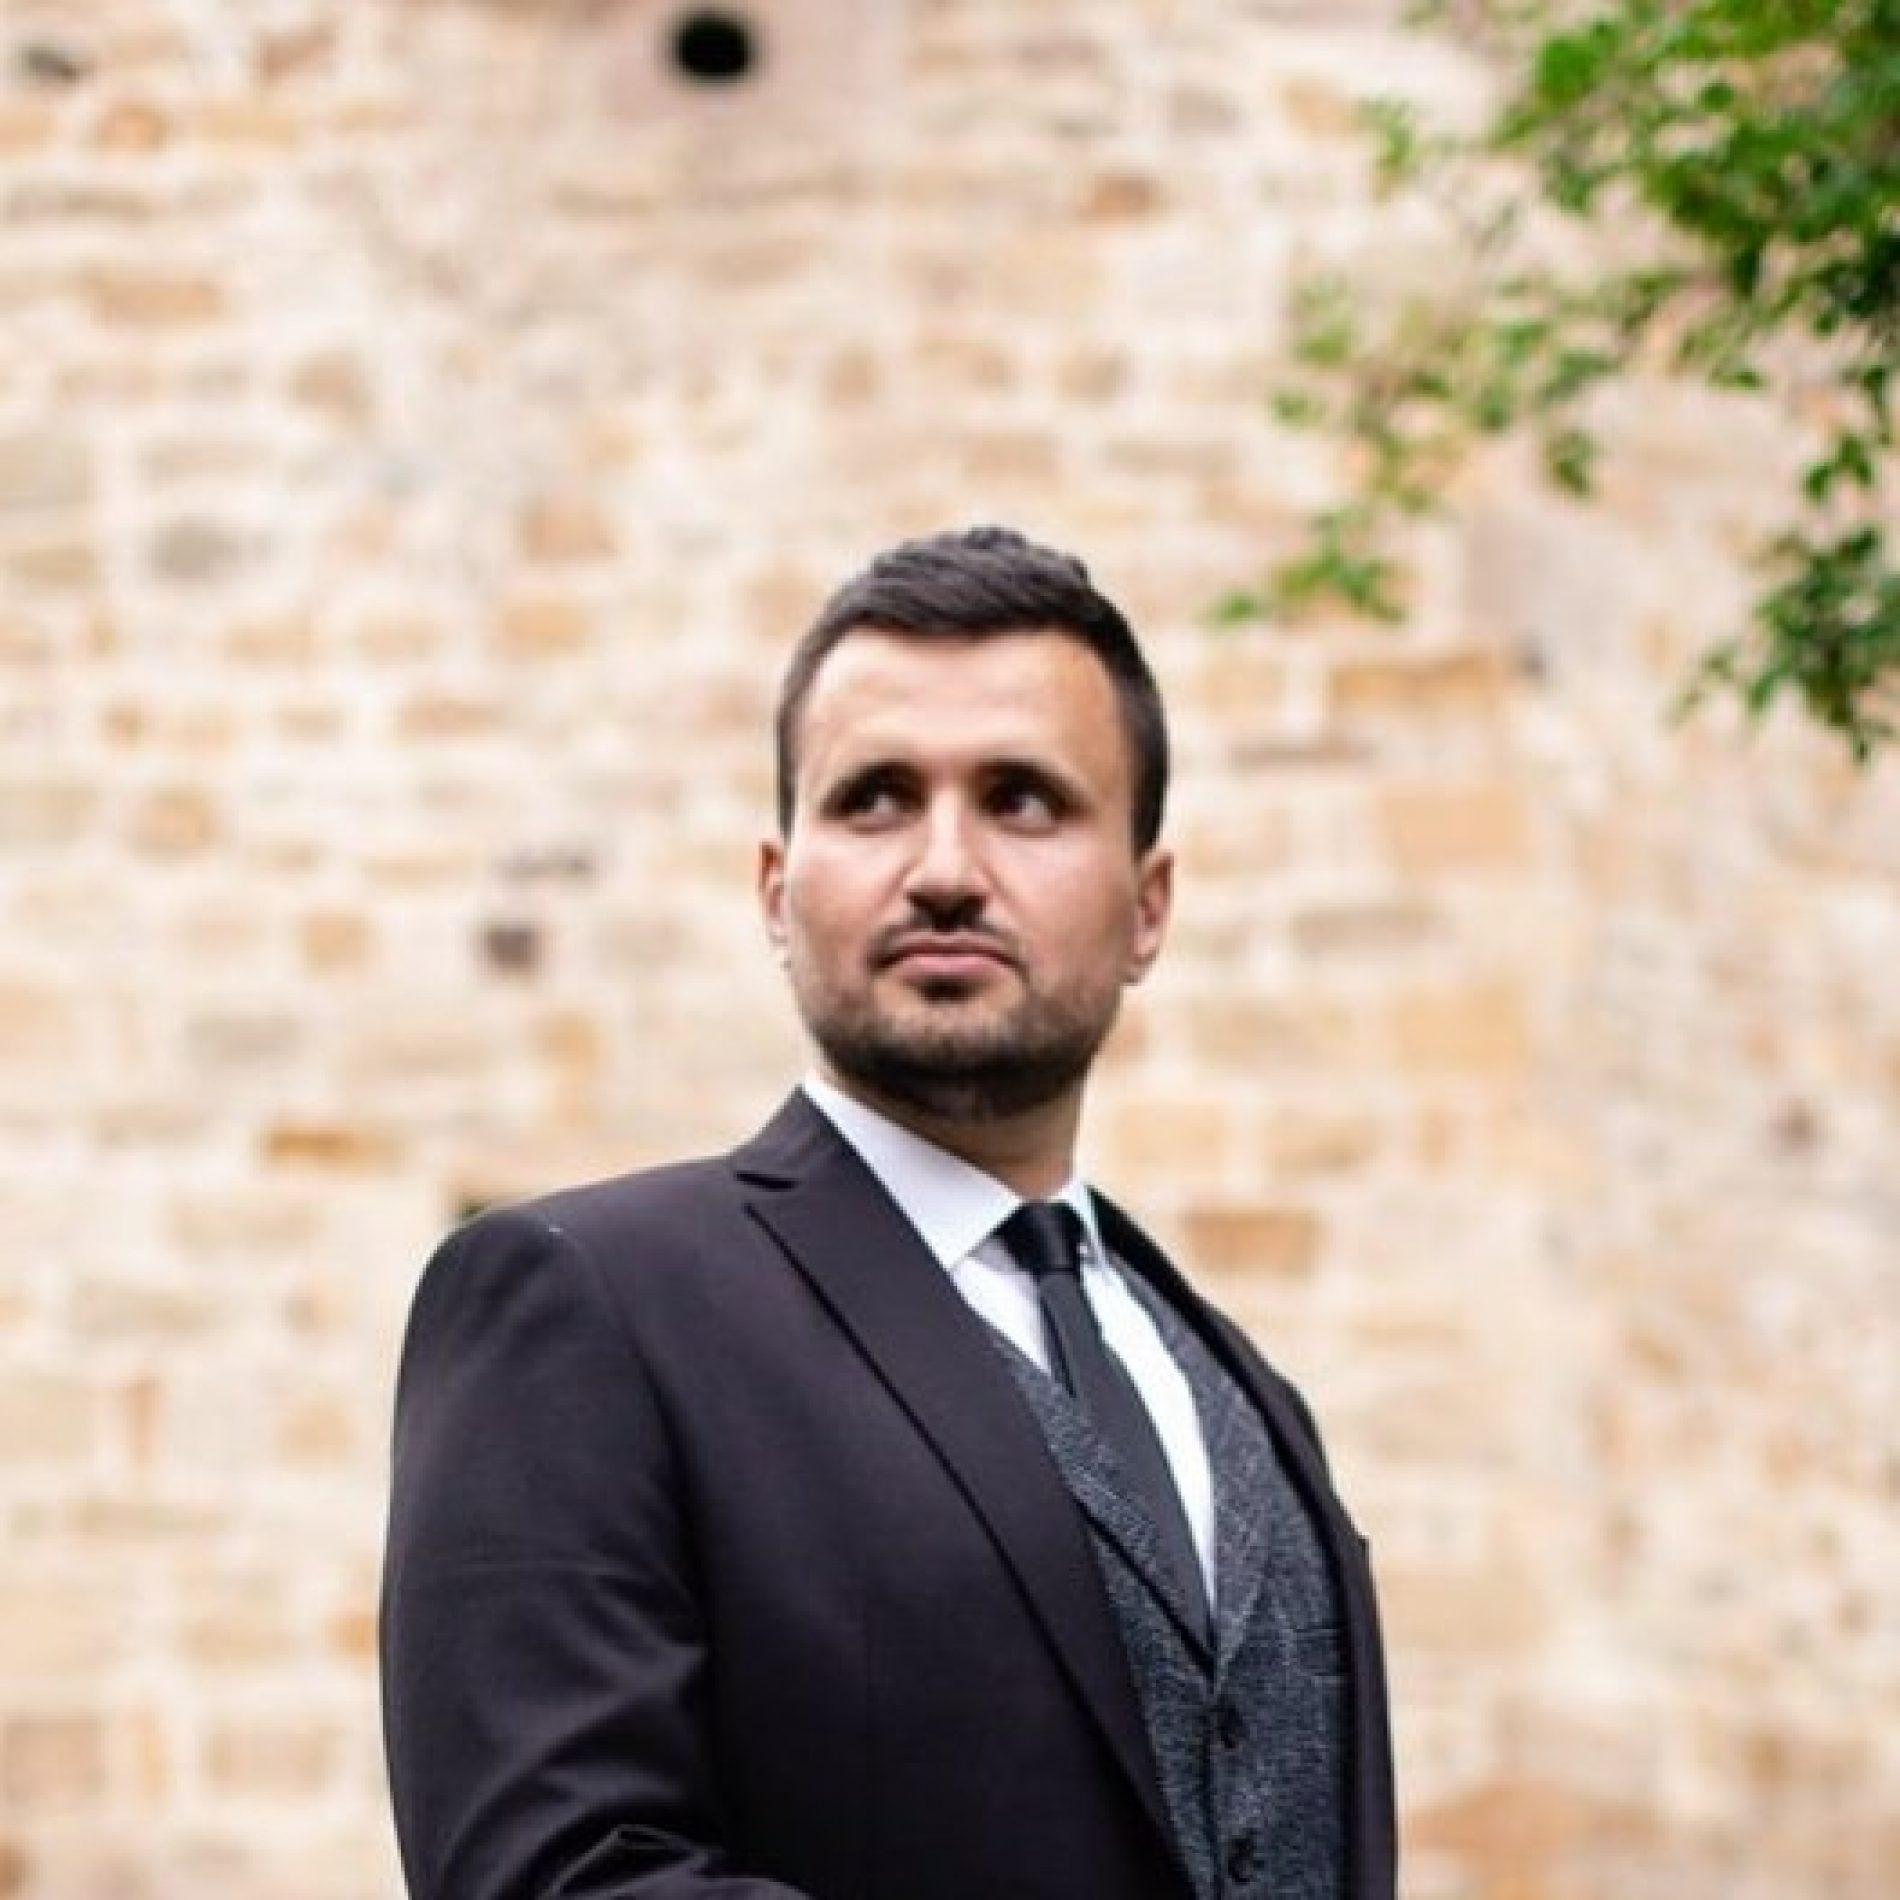 Smijenjen pomoćnik gradonačelnika Novog Pazara, kritikovao Vučićevu posjetu gradu